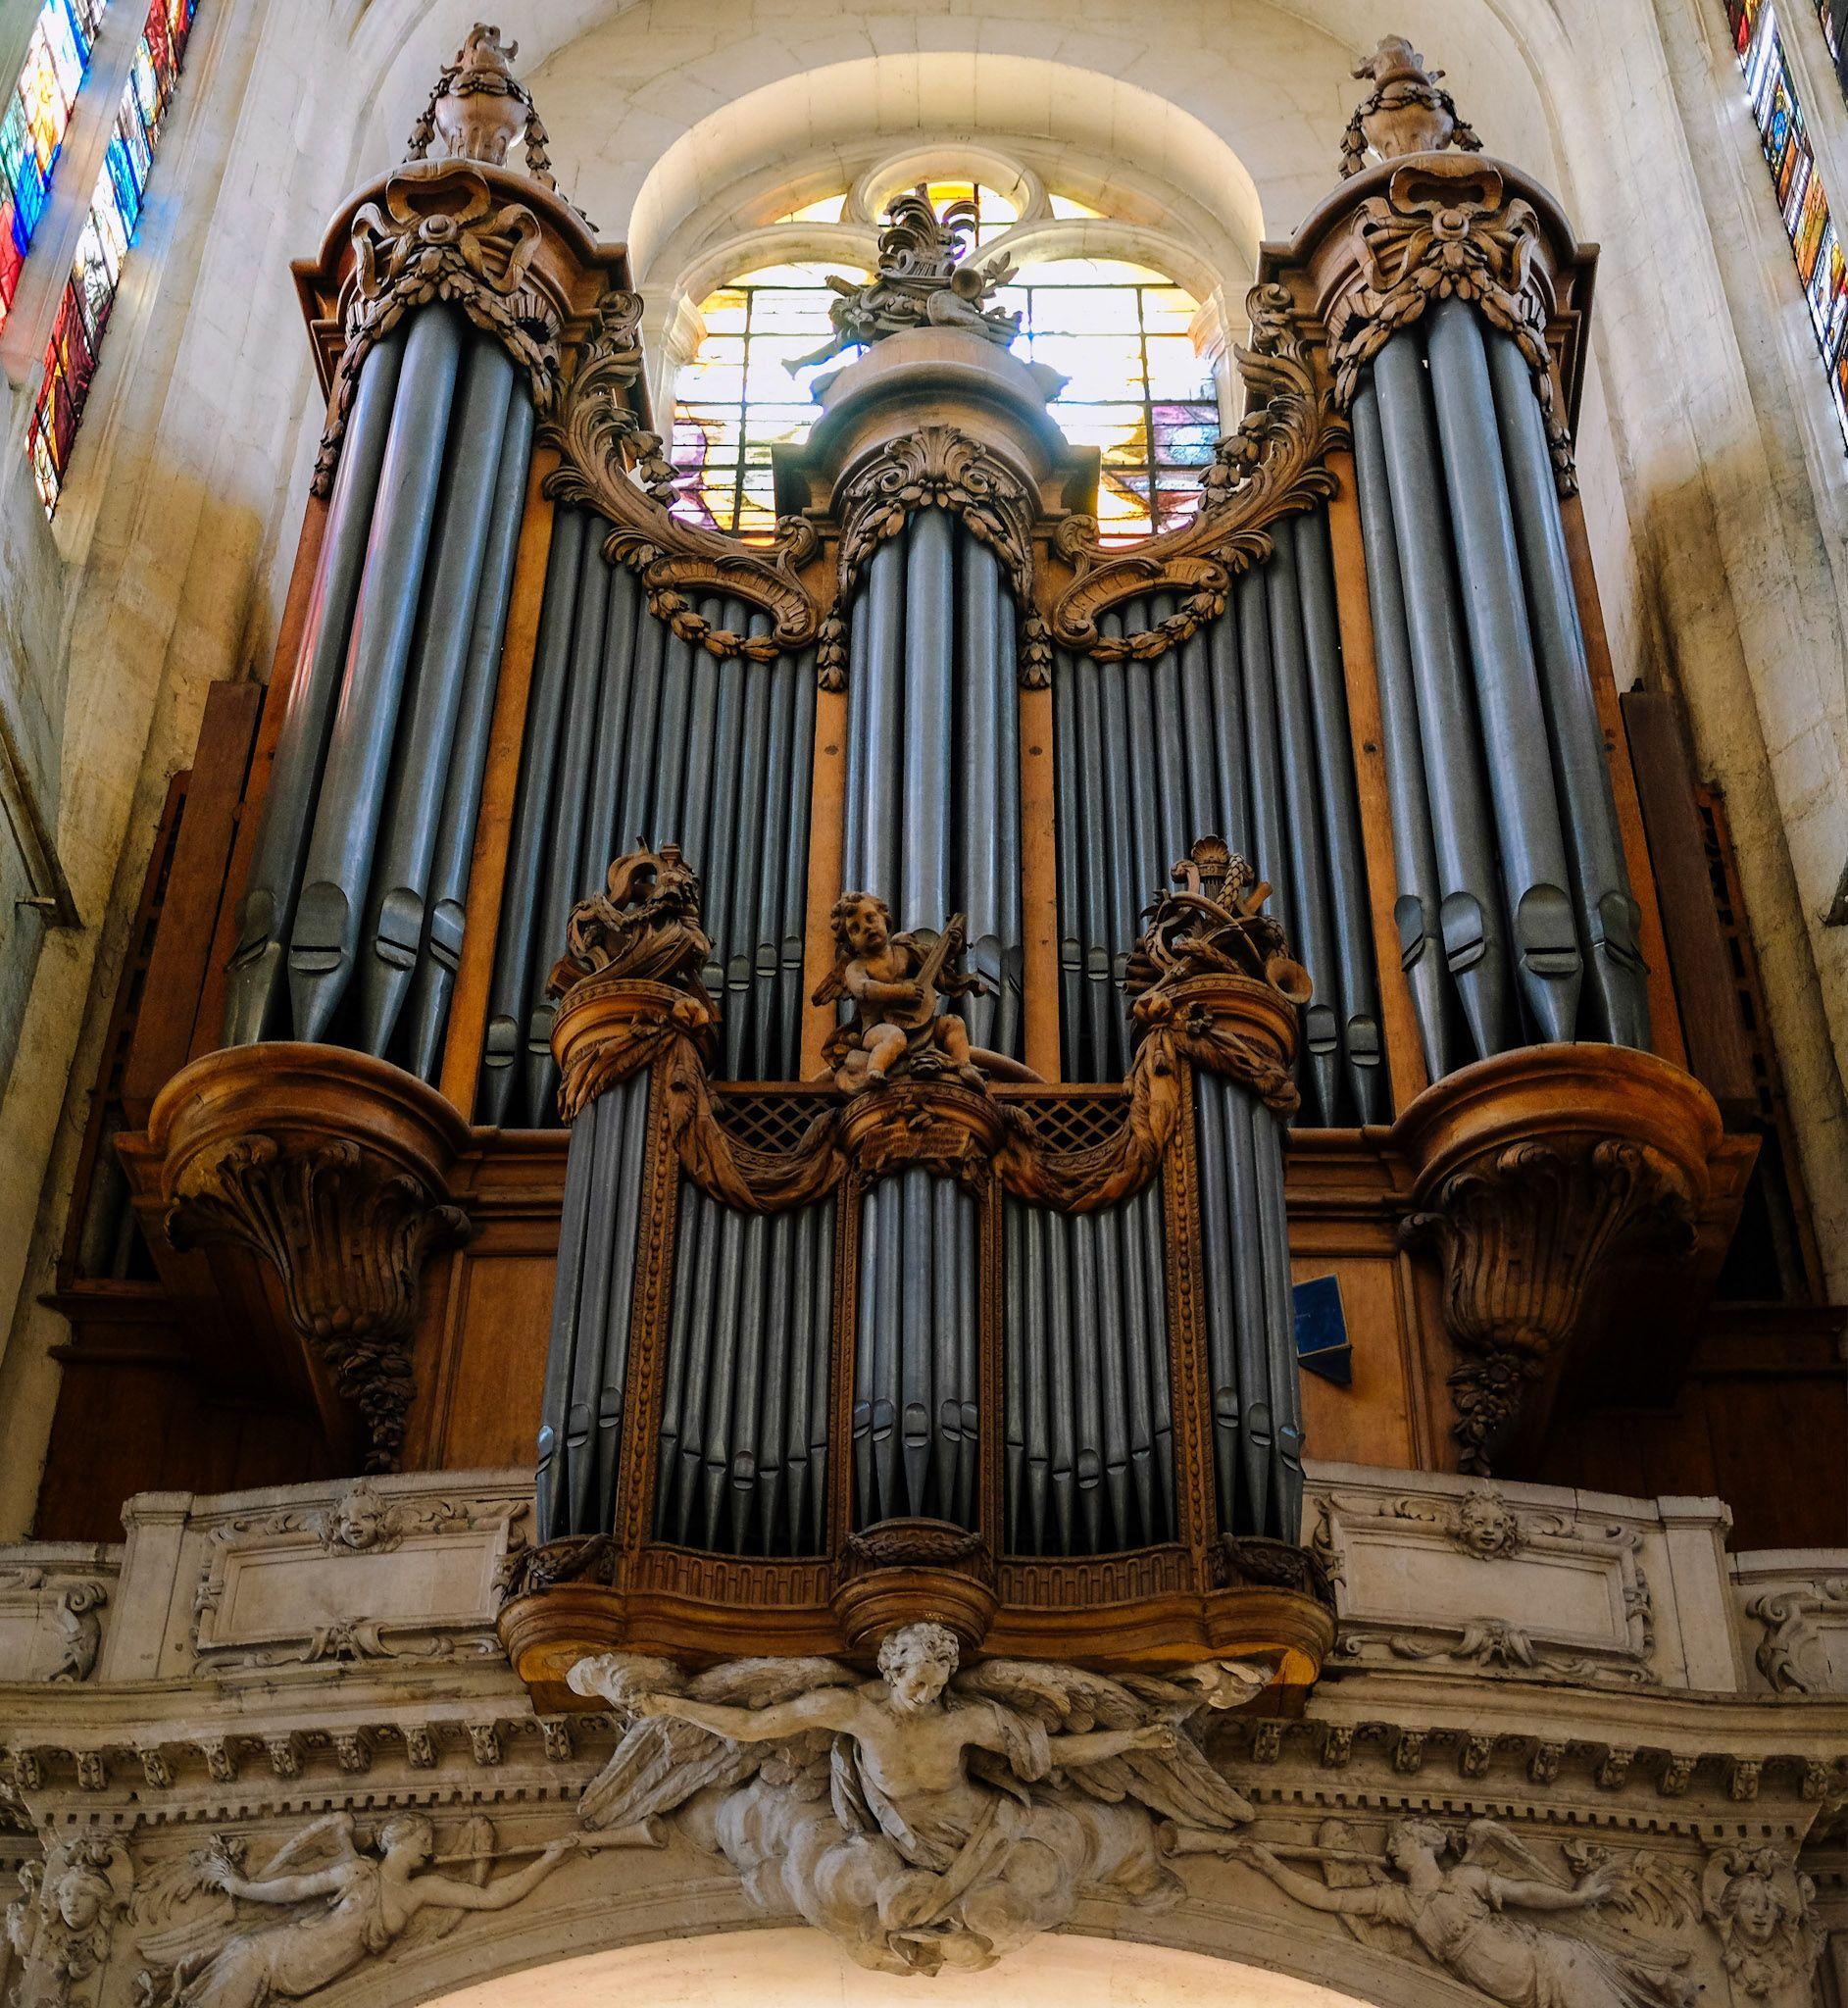 Chapel organ pipes, Paris